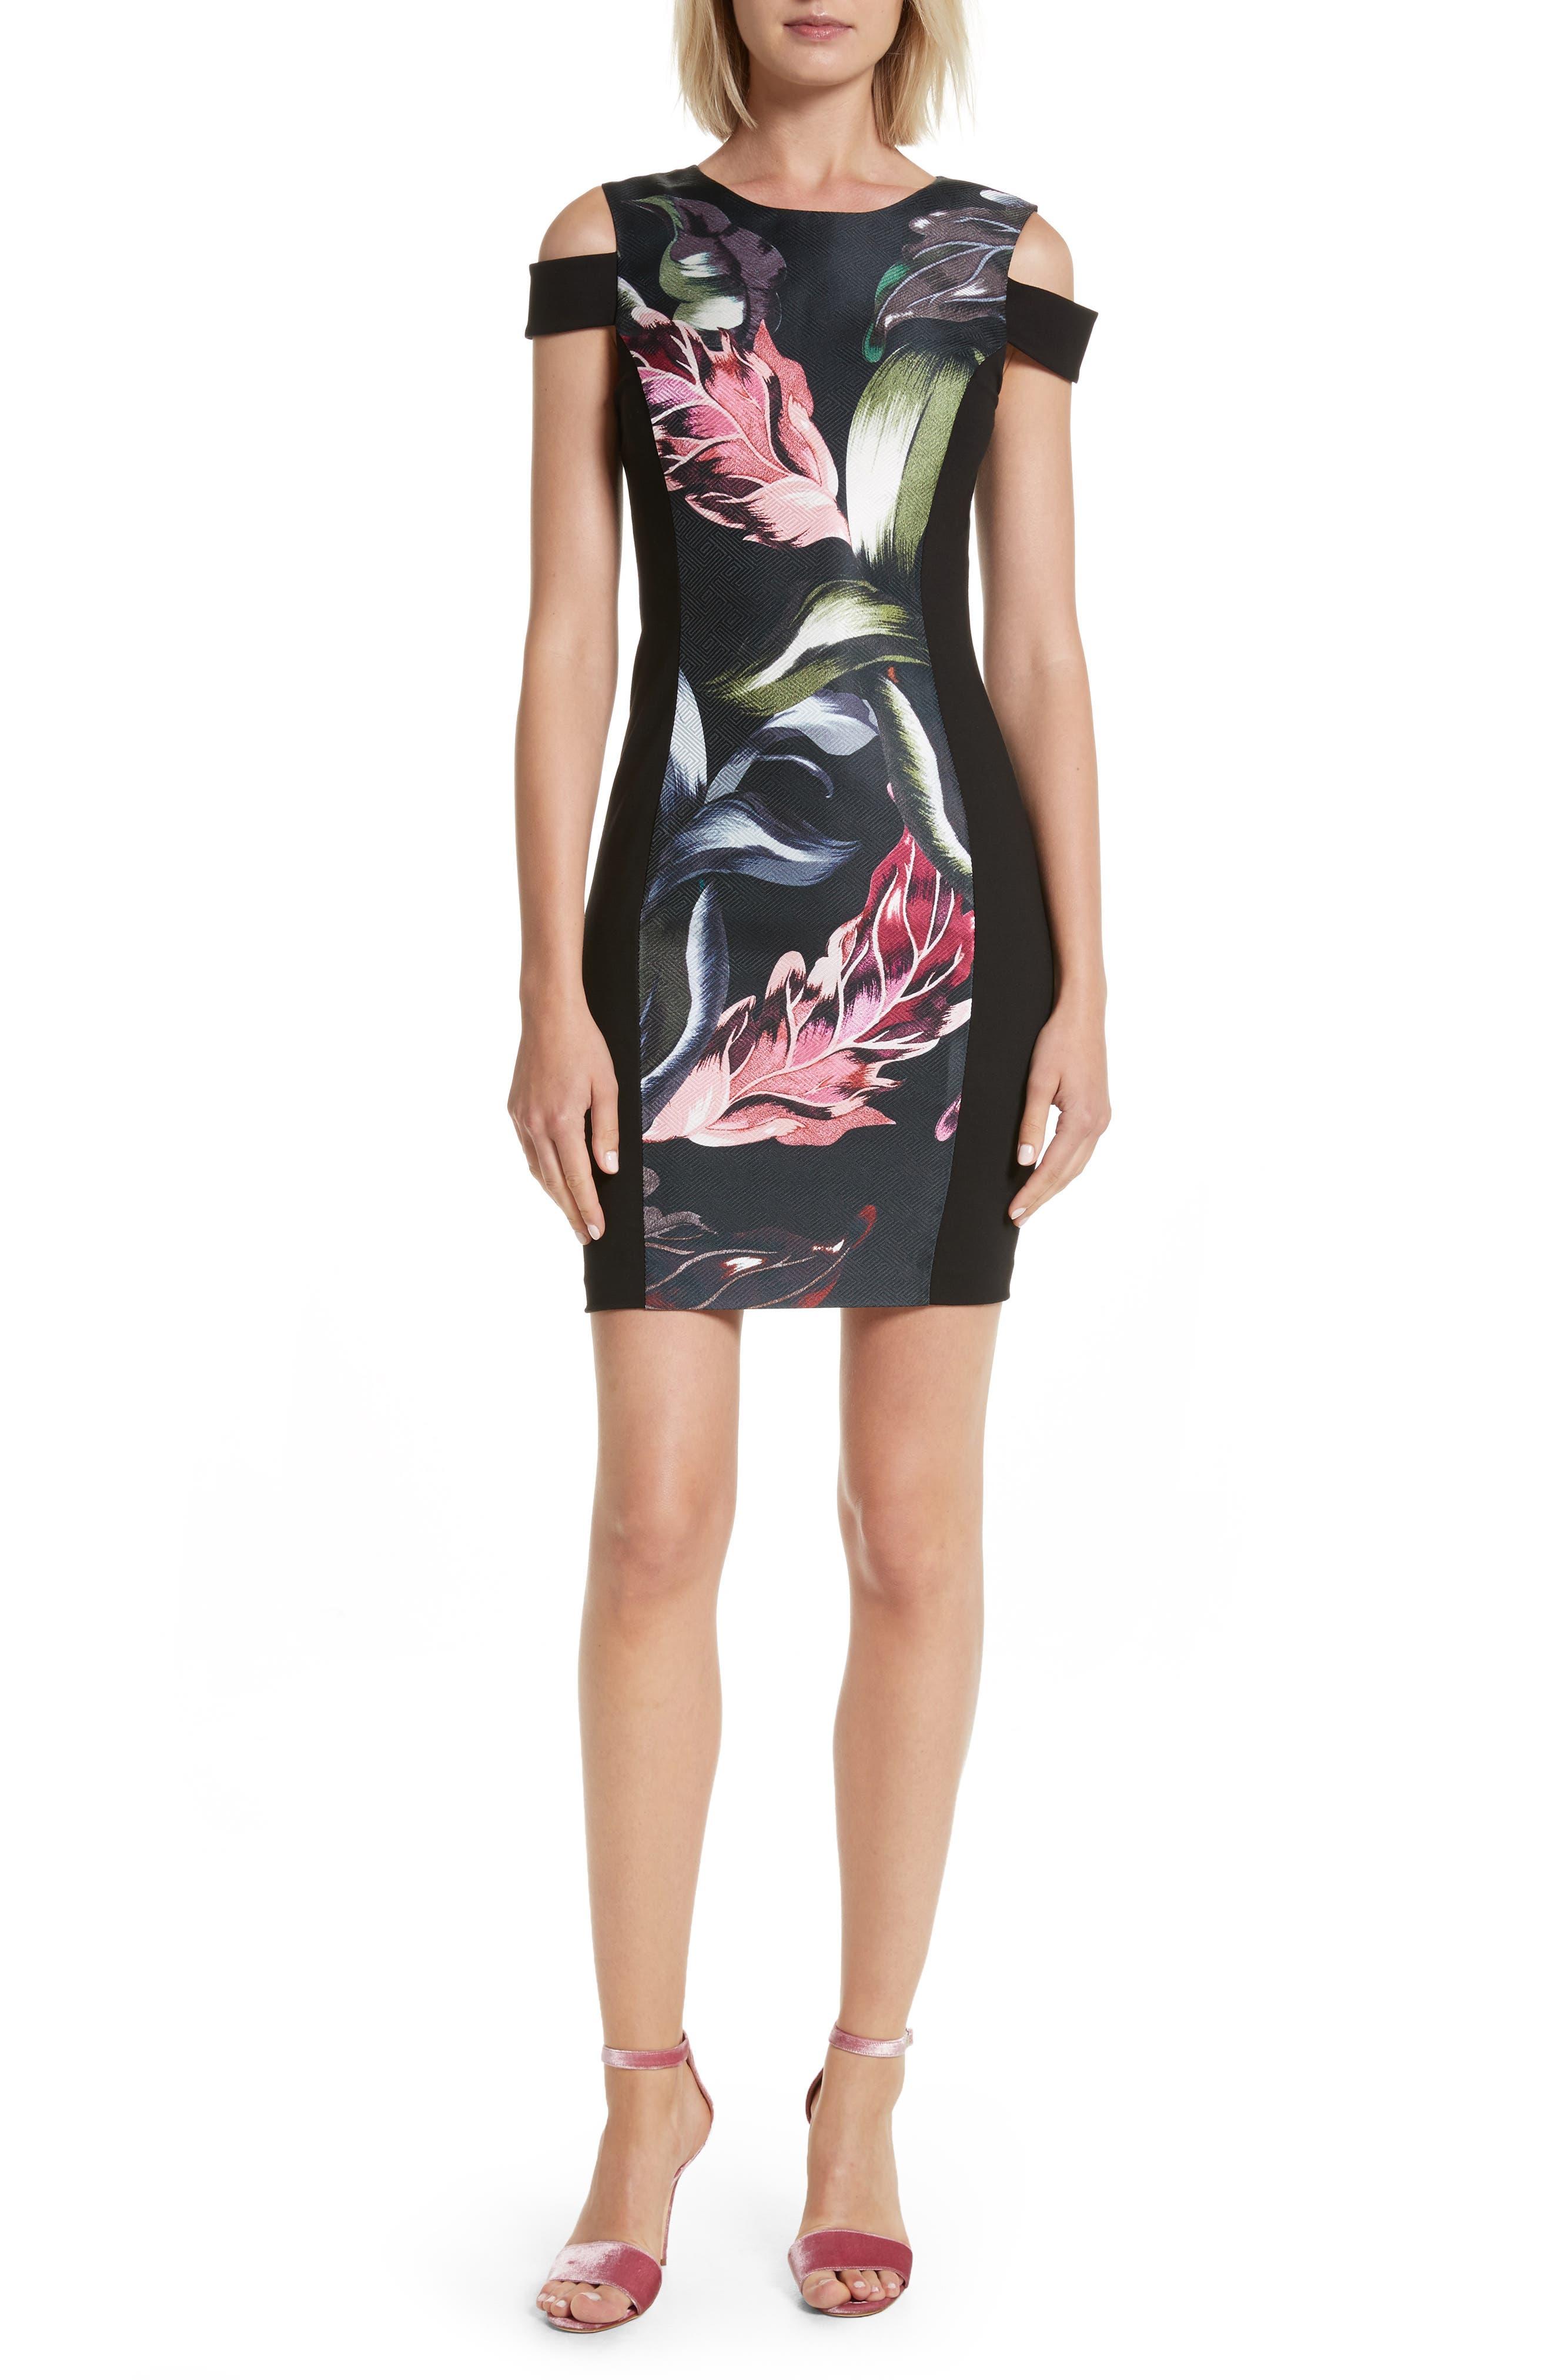 Leeash Eden Body Con Dress,                         Main,                         color, Black